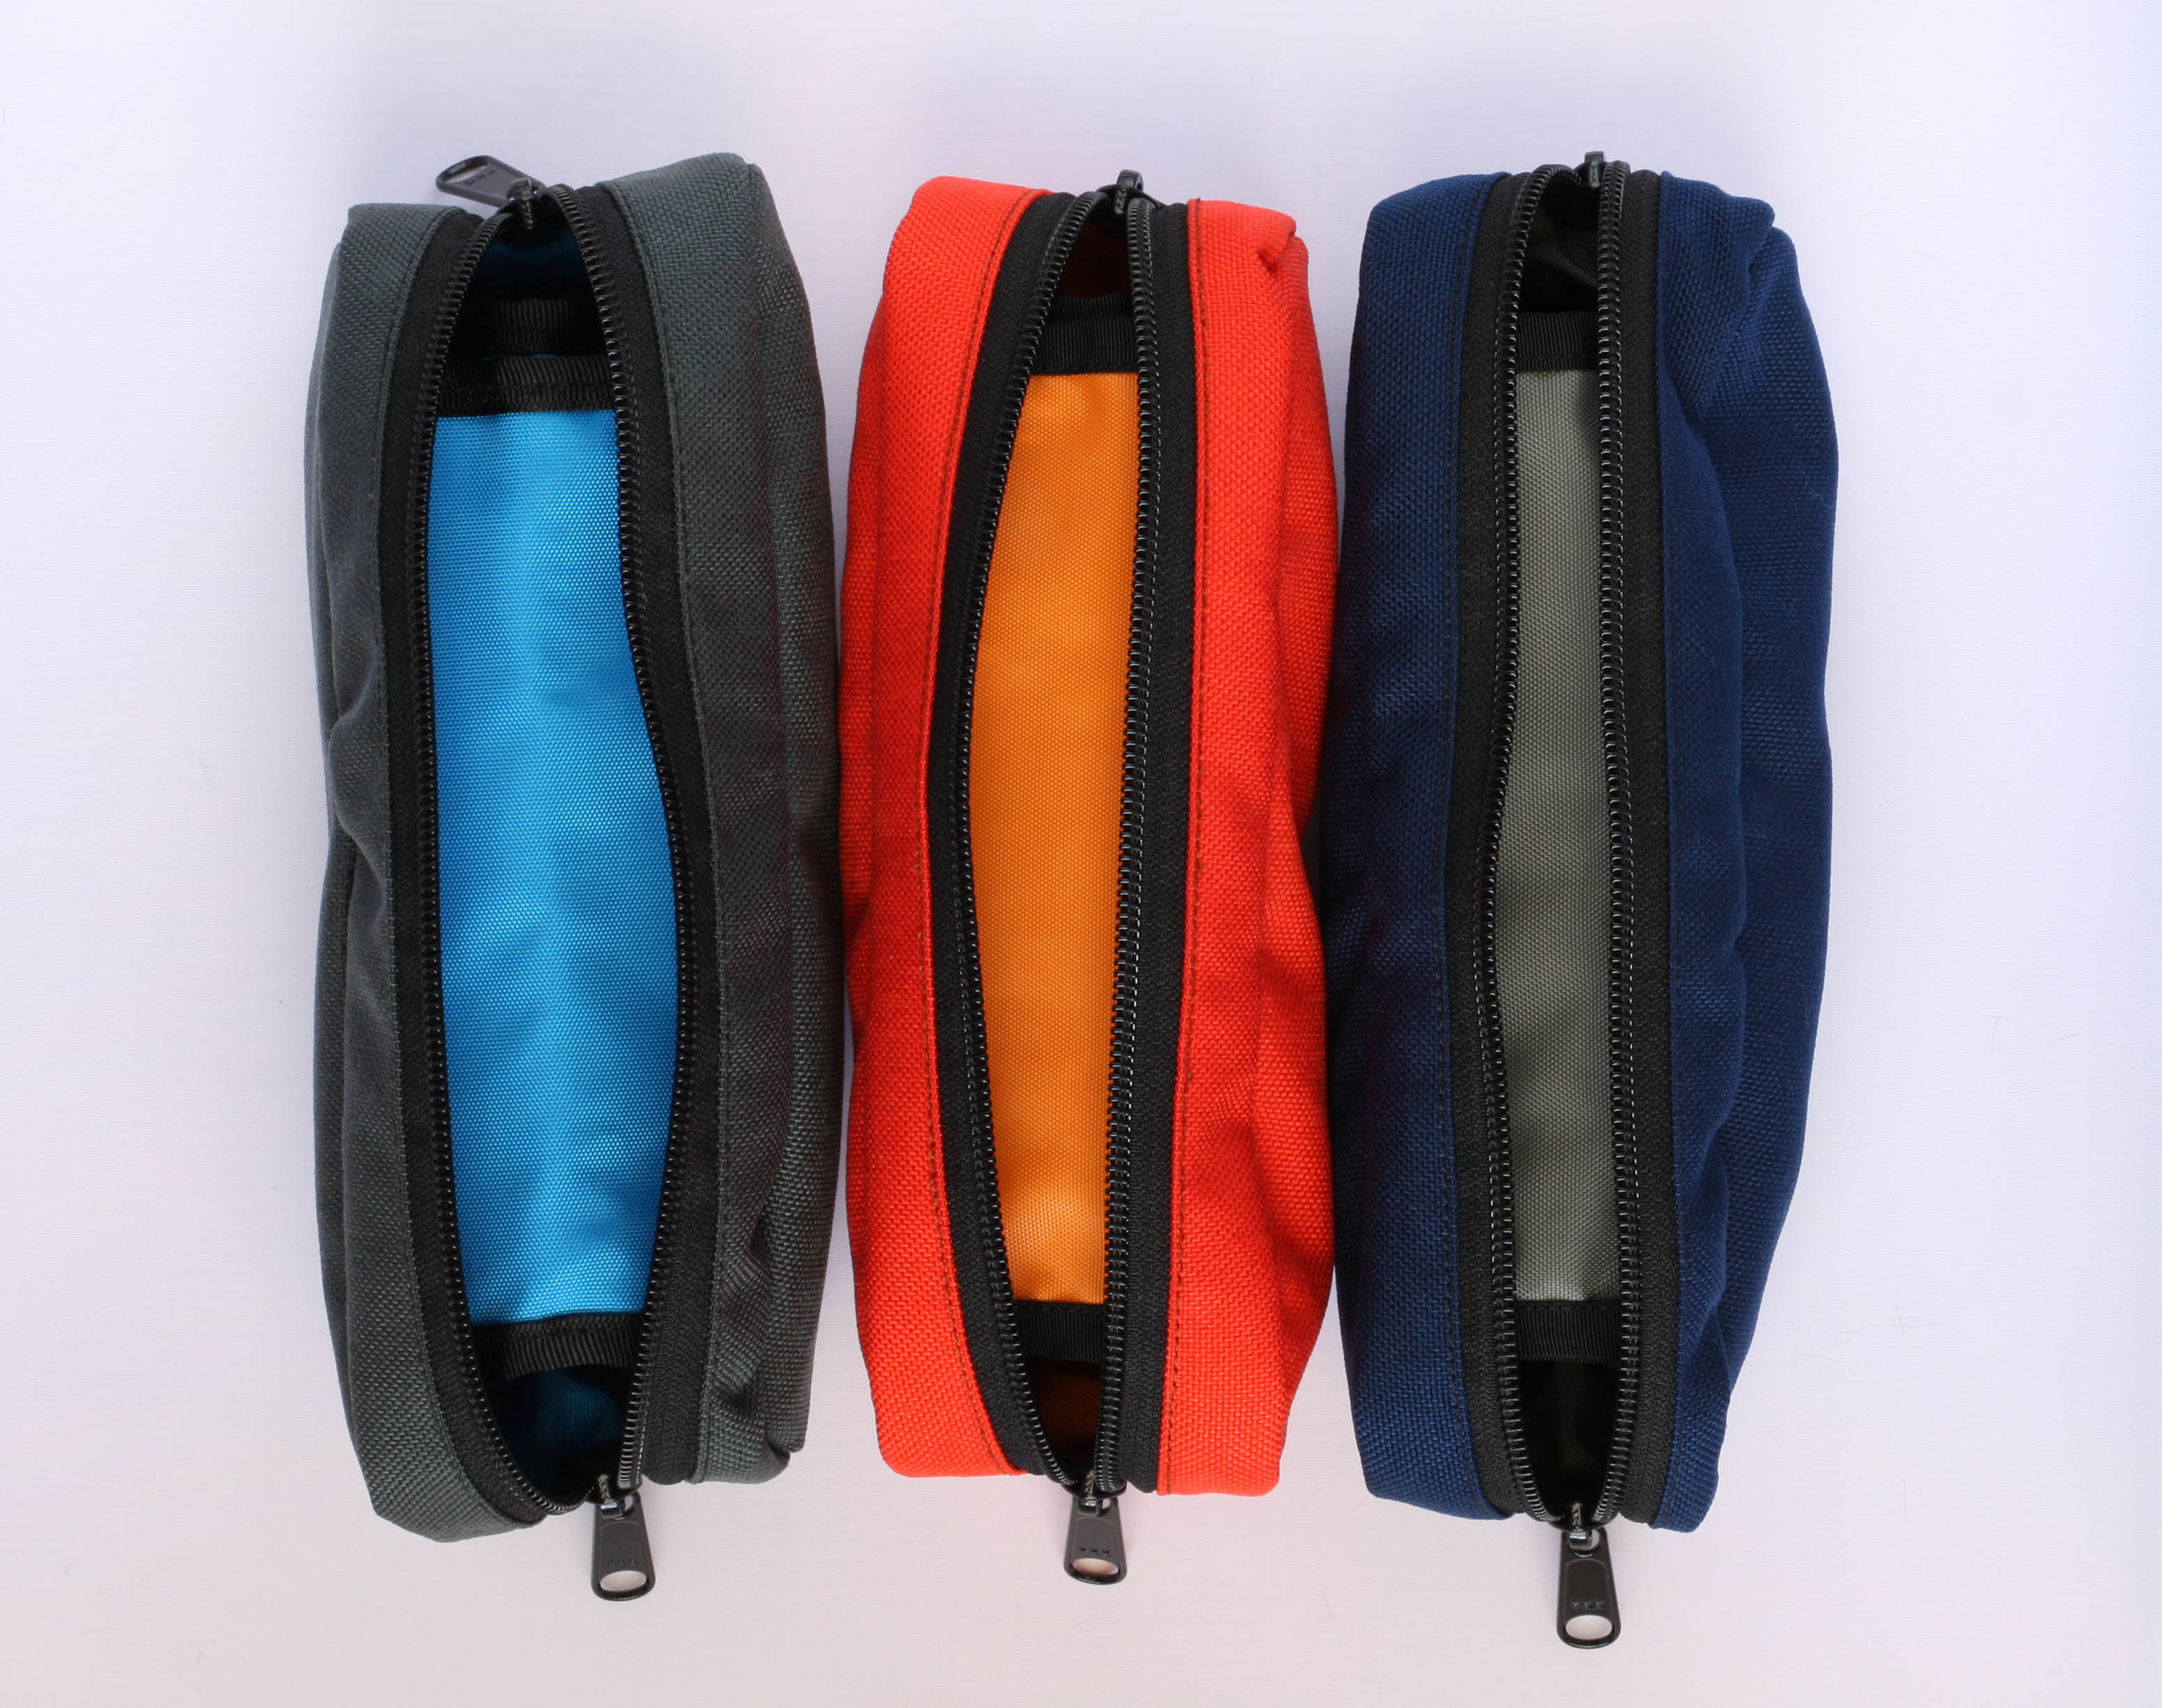 The Brasstown - Our Zip Roll Pen Case